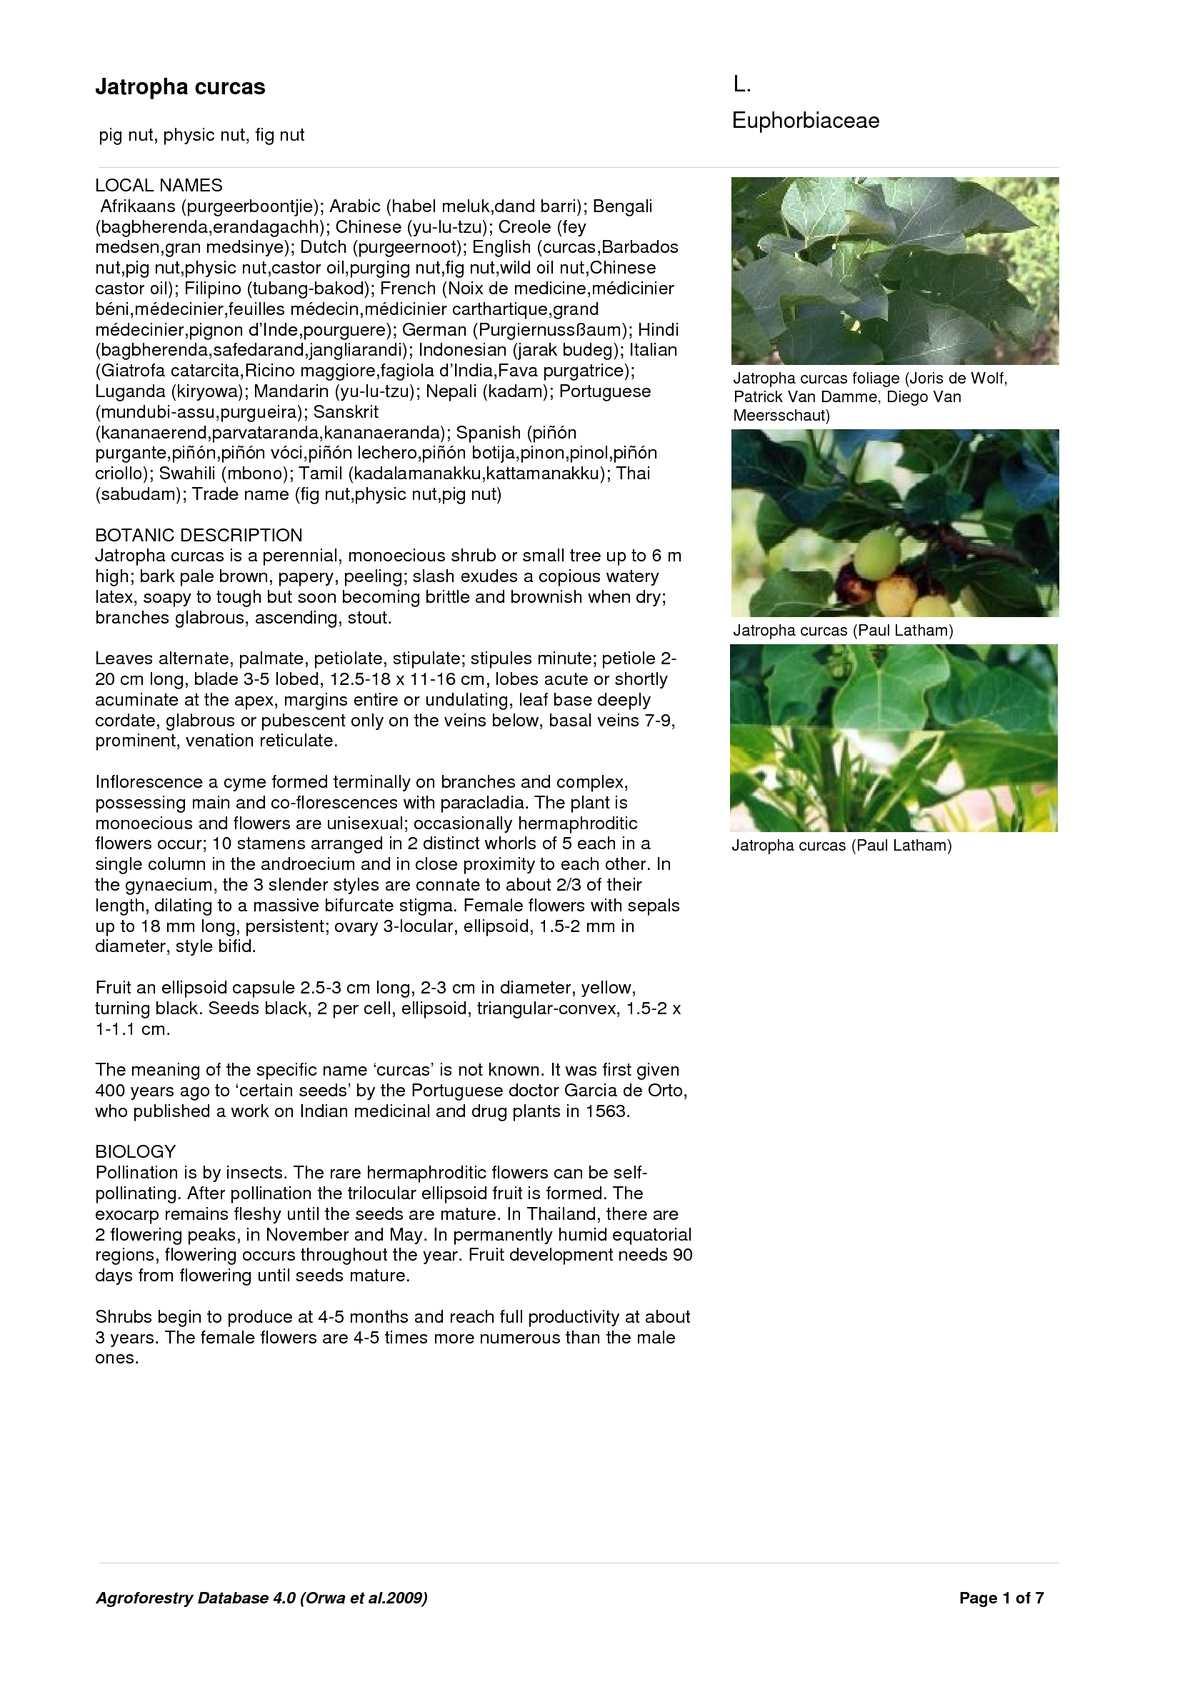 100 seeds PHYSIC NUT Barbados rare JATROPHA CURCAS diesel drought tolerant seed